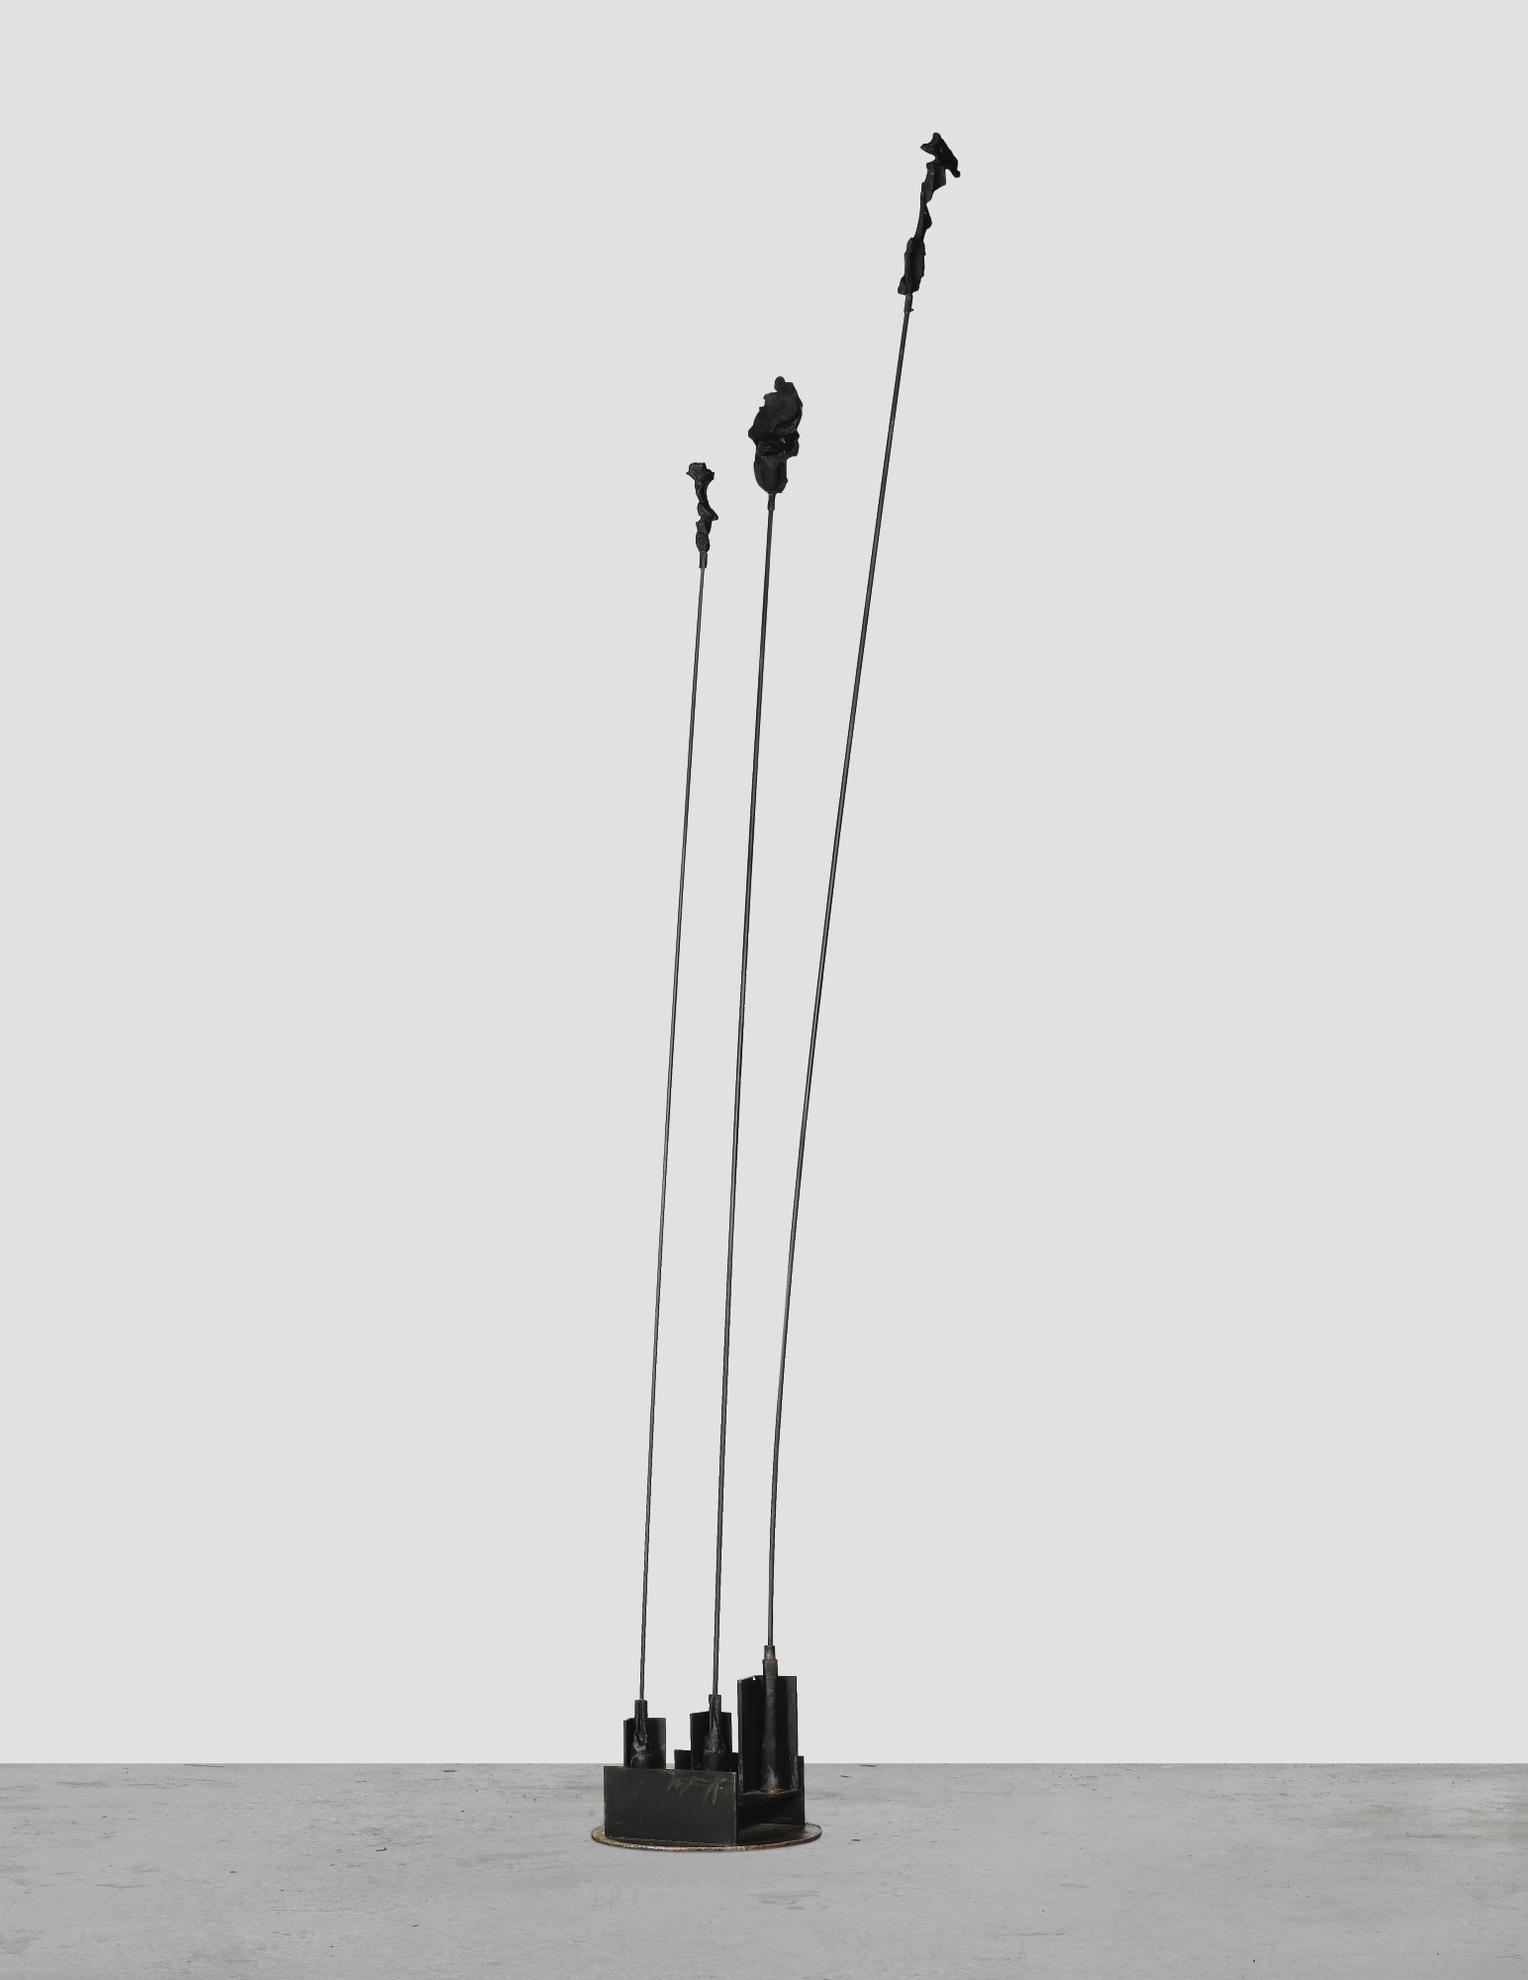 Panayiotis Vassilakis Takis - Signal-1978